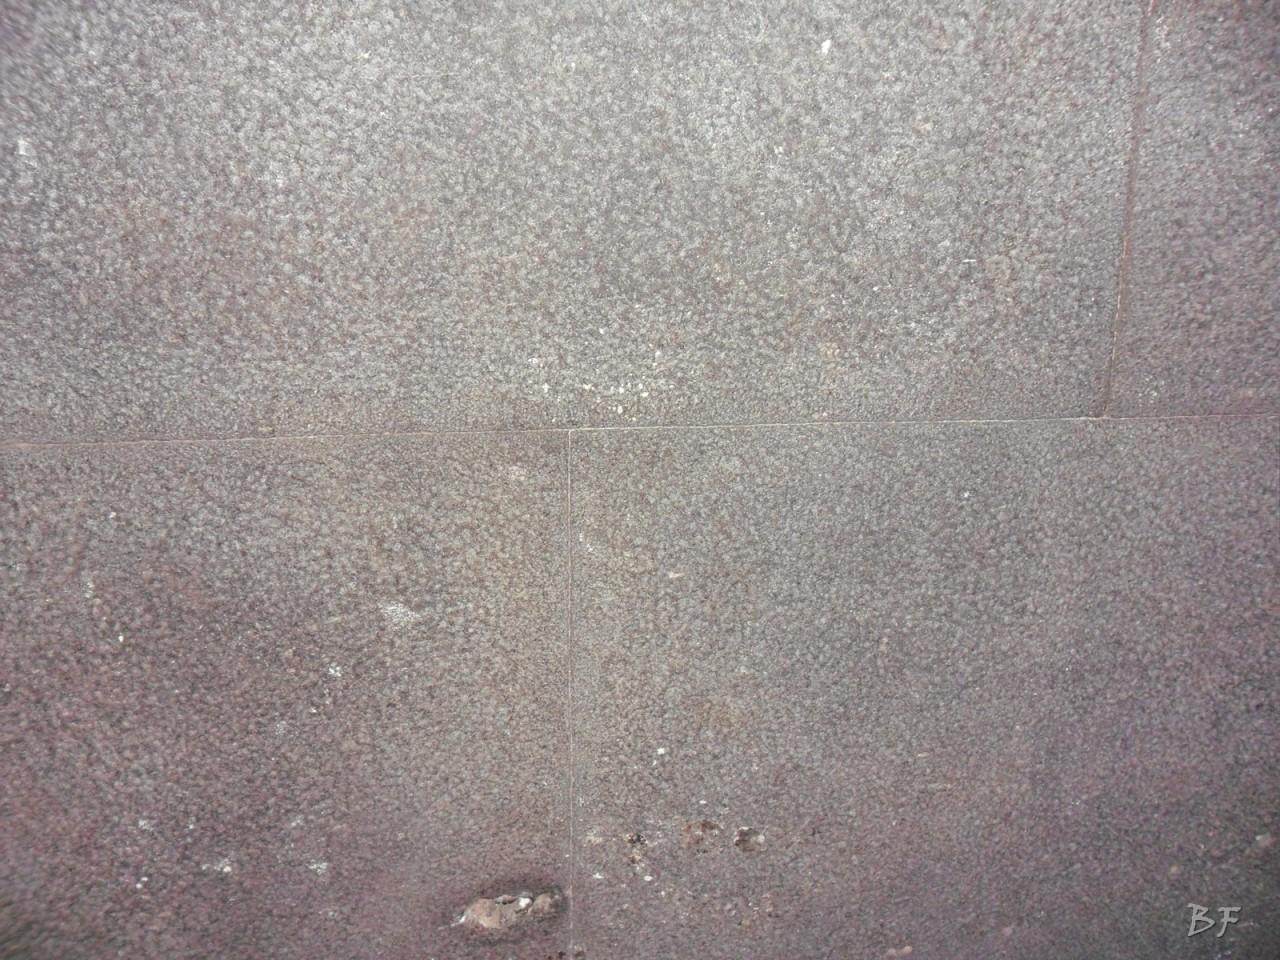 Mura-Poligonali-Megaliti-Tempio-Coricancha-Cusco-Perù-56